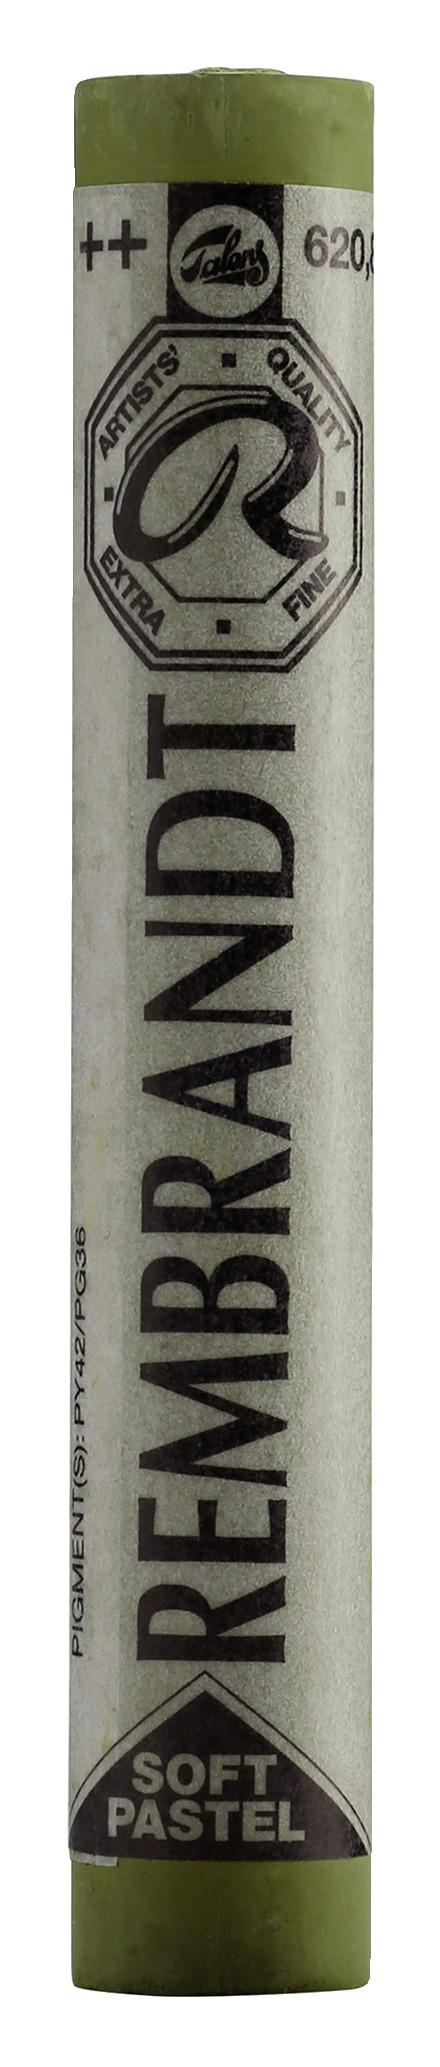 Rembrandt Soft Pastel Round Full Stick Olive Green(8) (620.8)